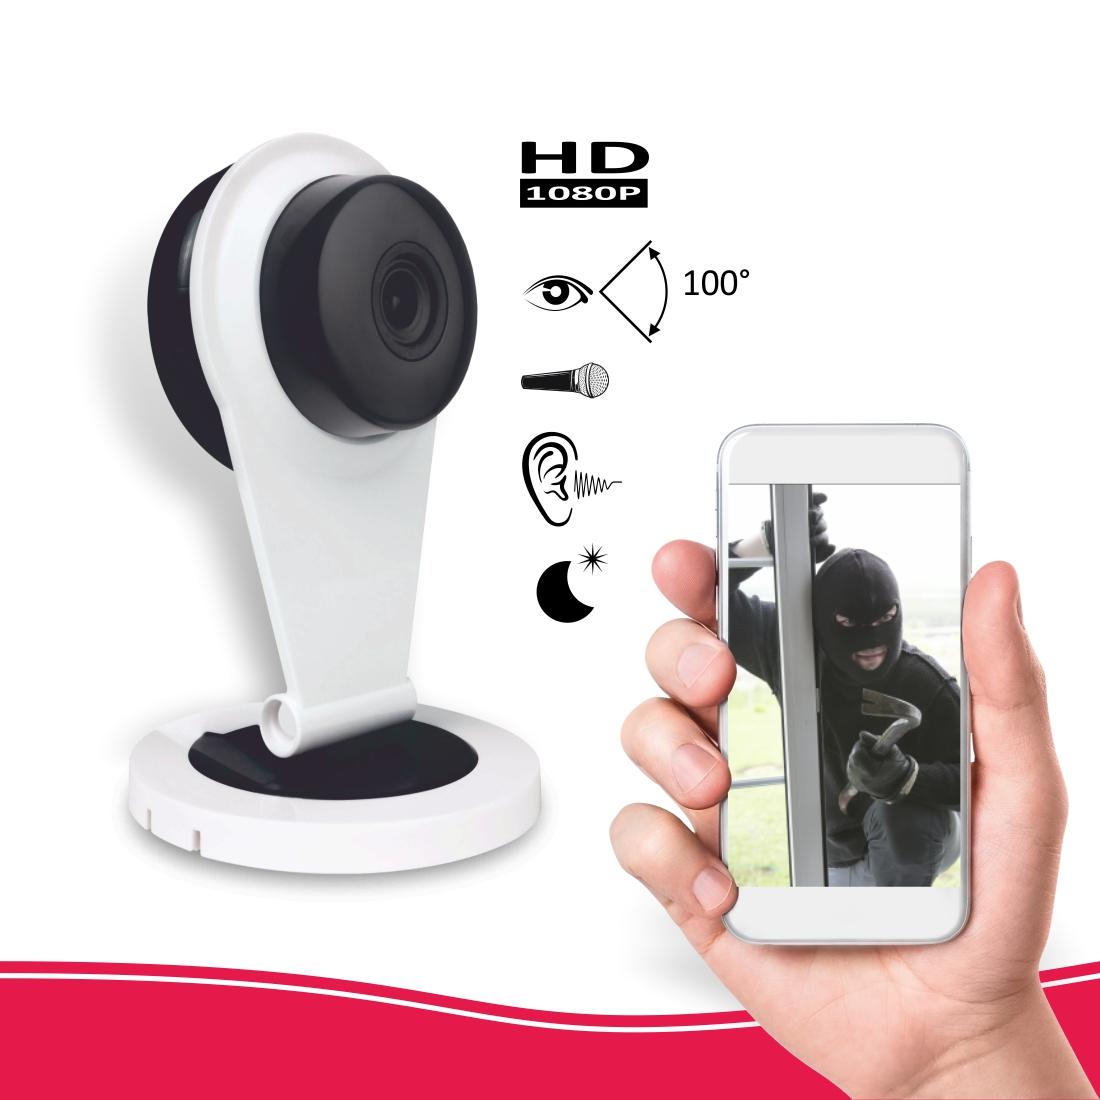 Smart Home HD Beveiligingscamera